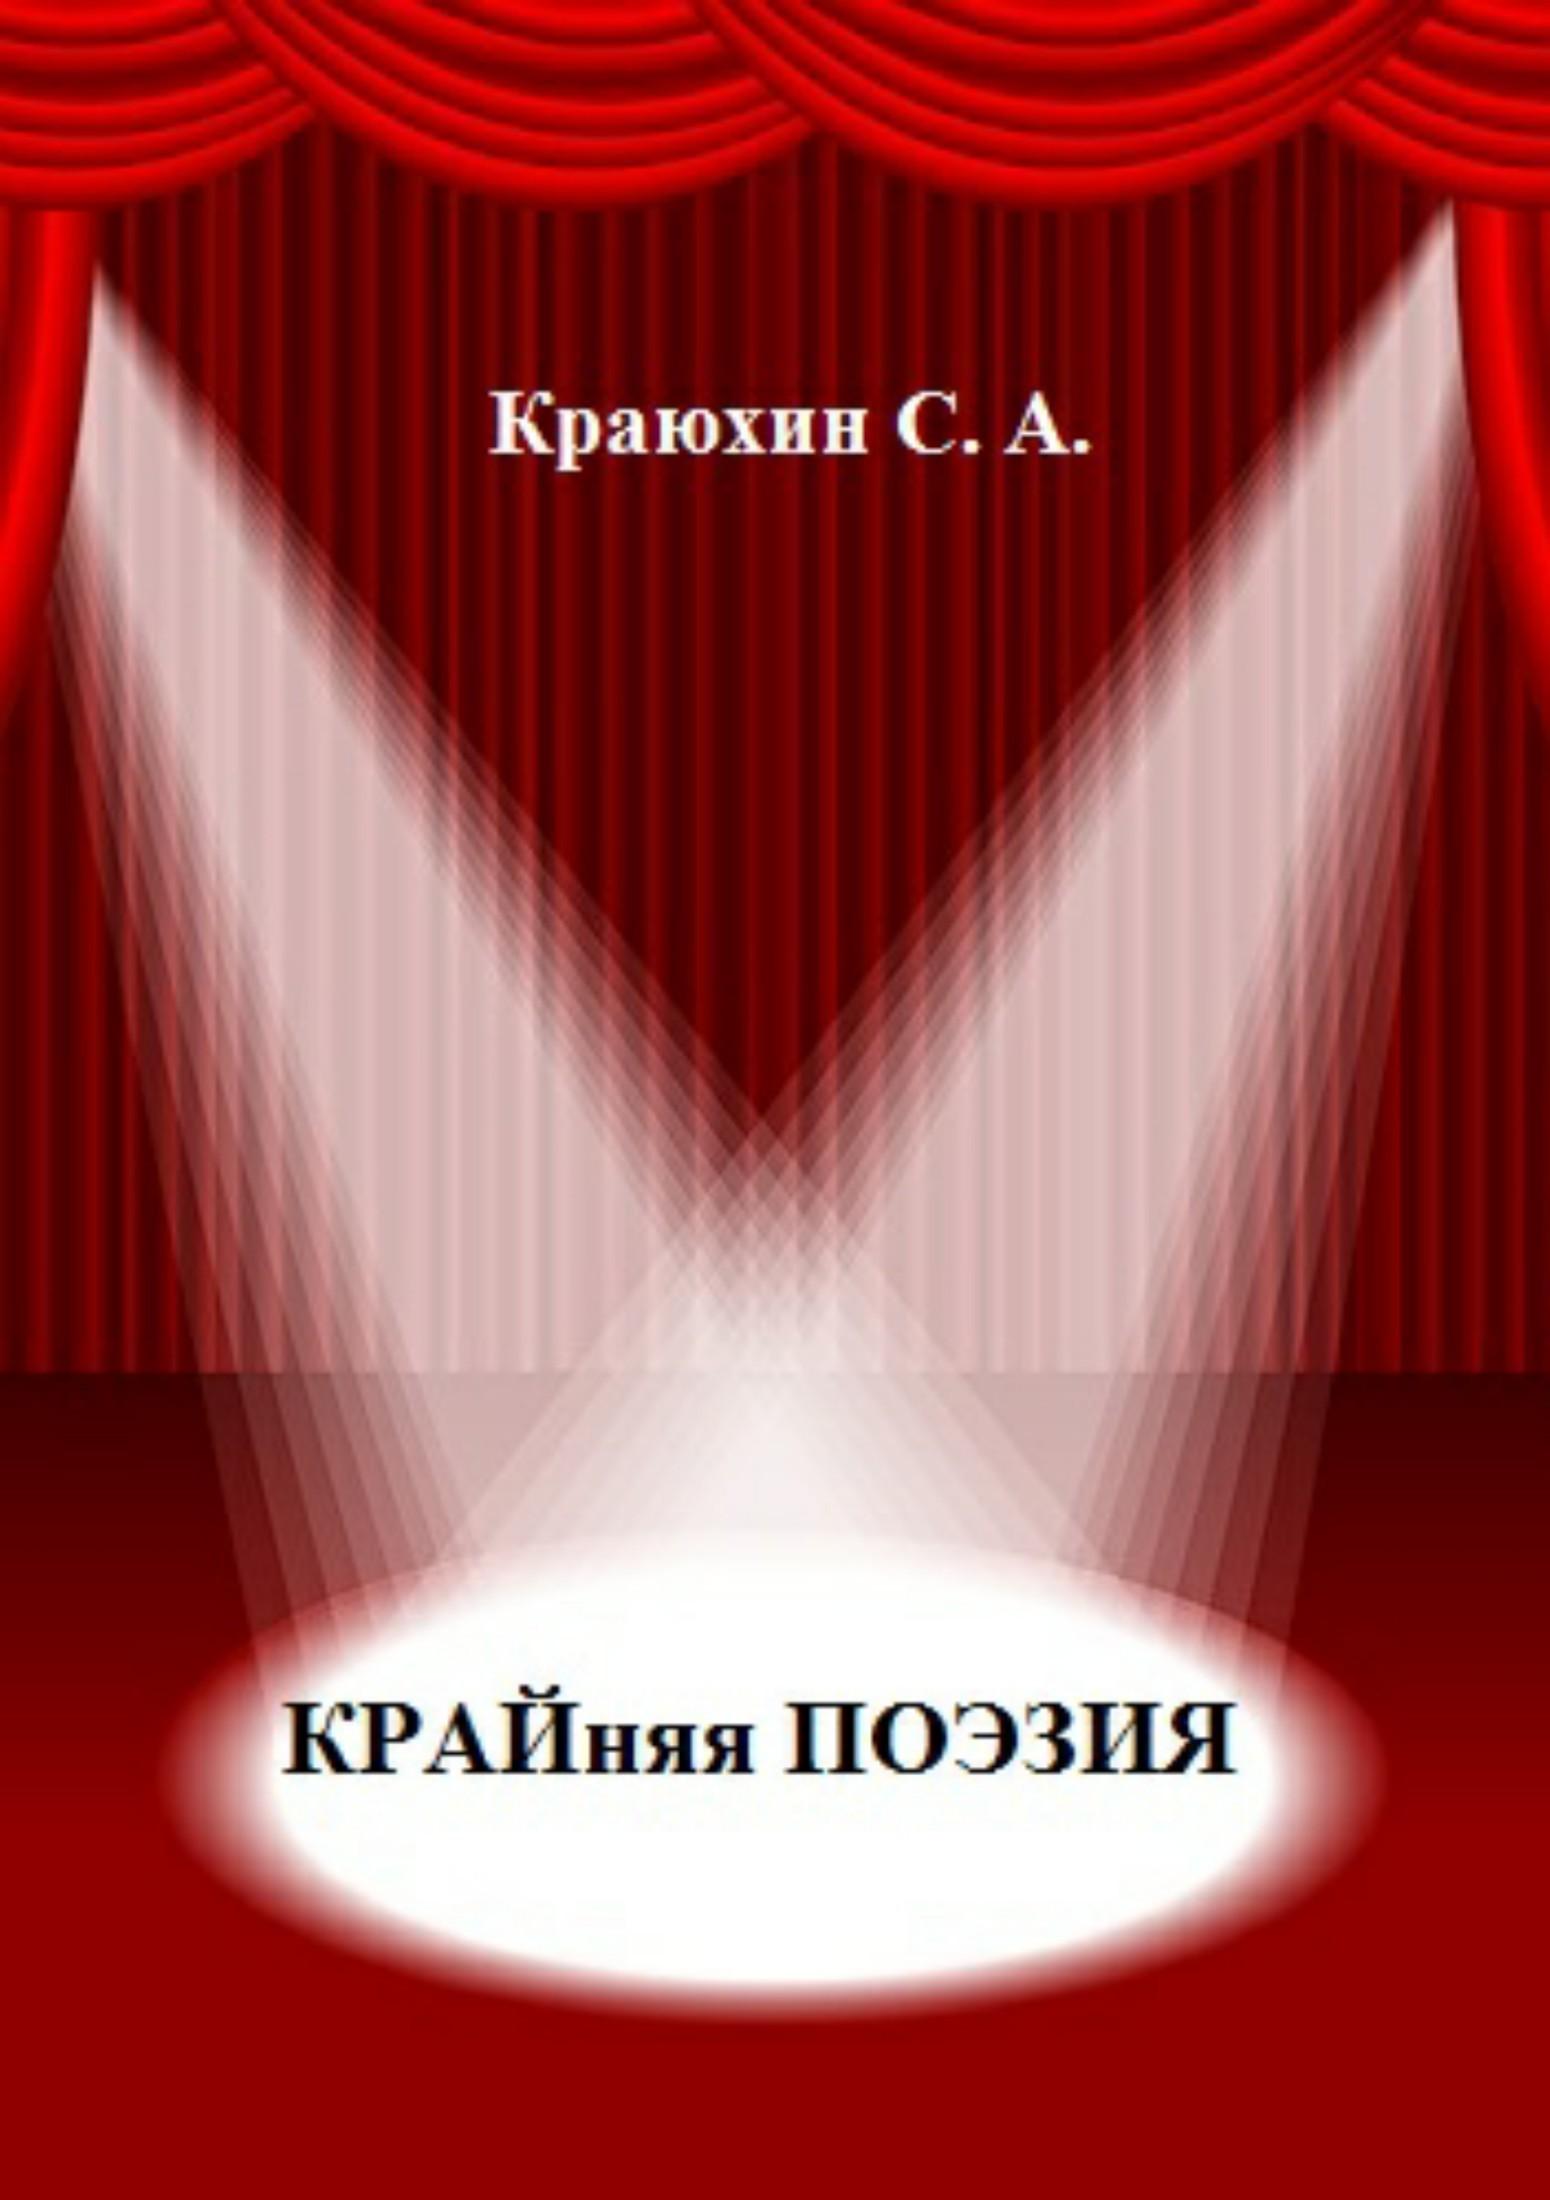 Сергей Александрович Краюхин Крайняя поэзия сергей александрович краюхин крайняя поэзия